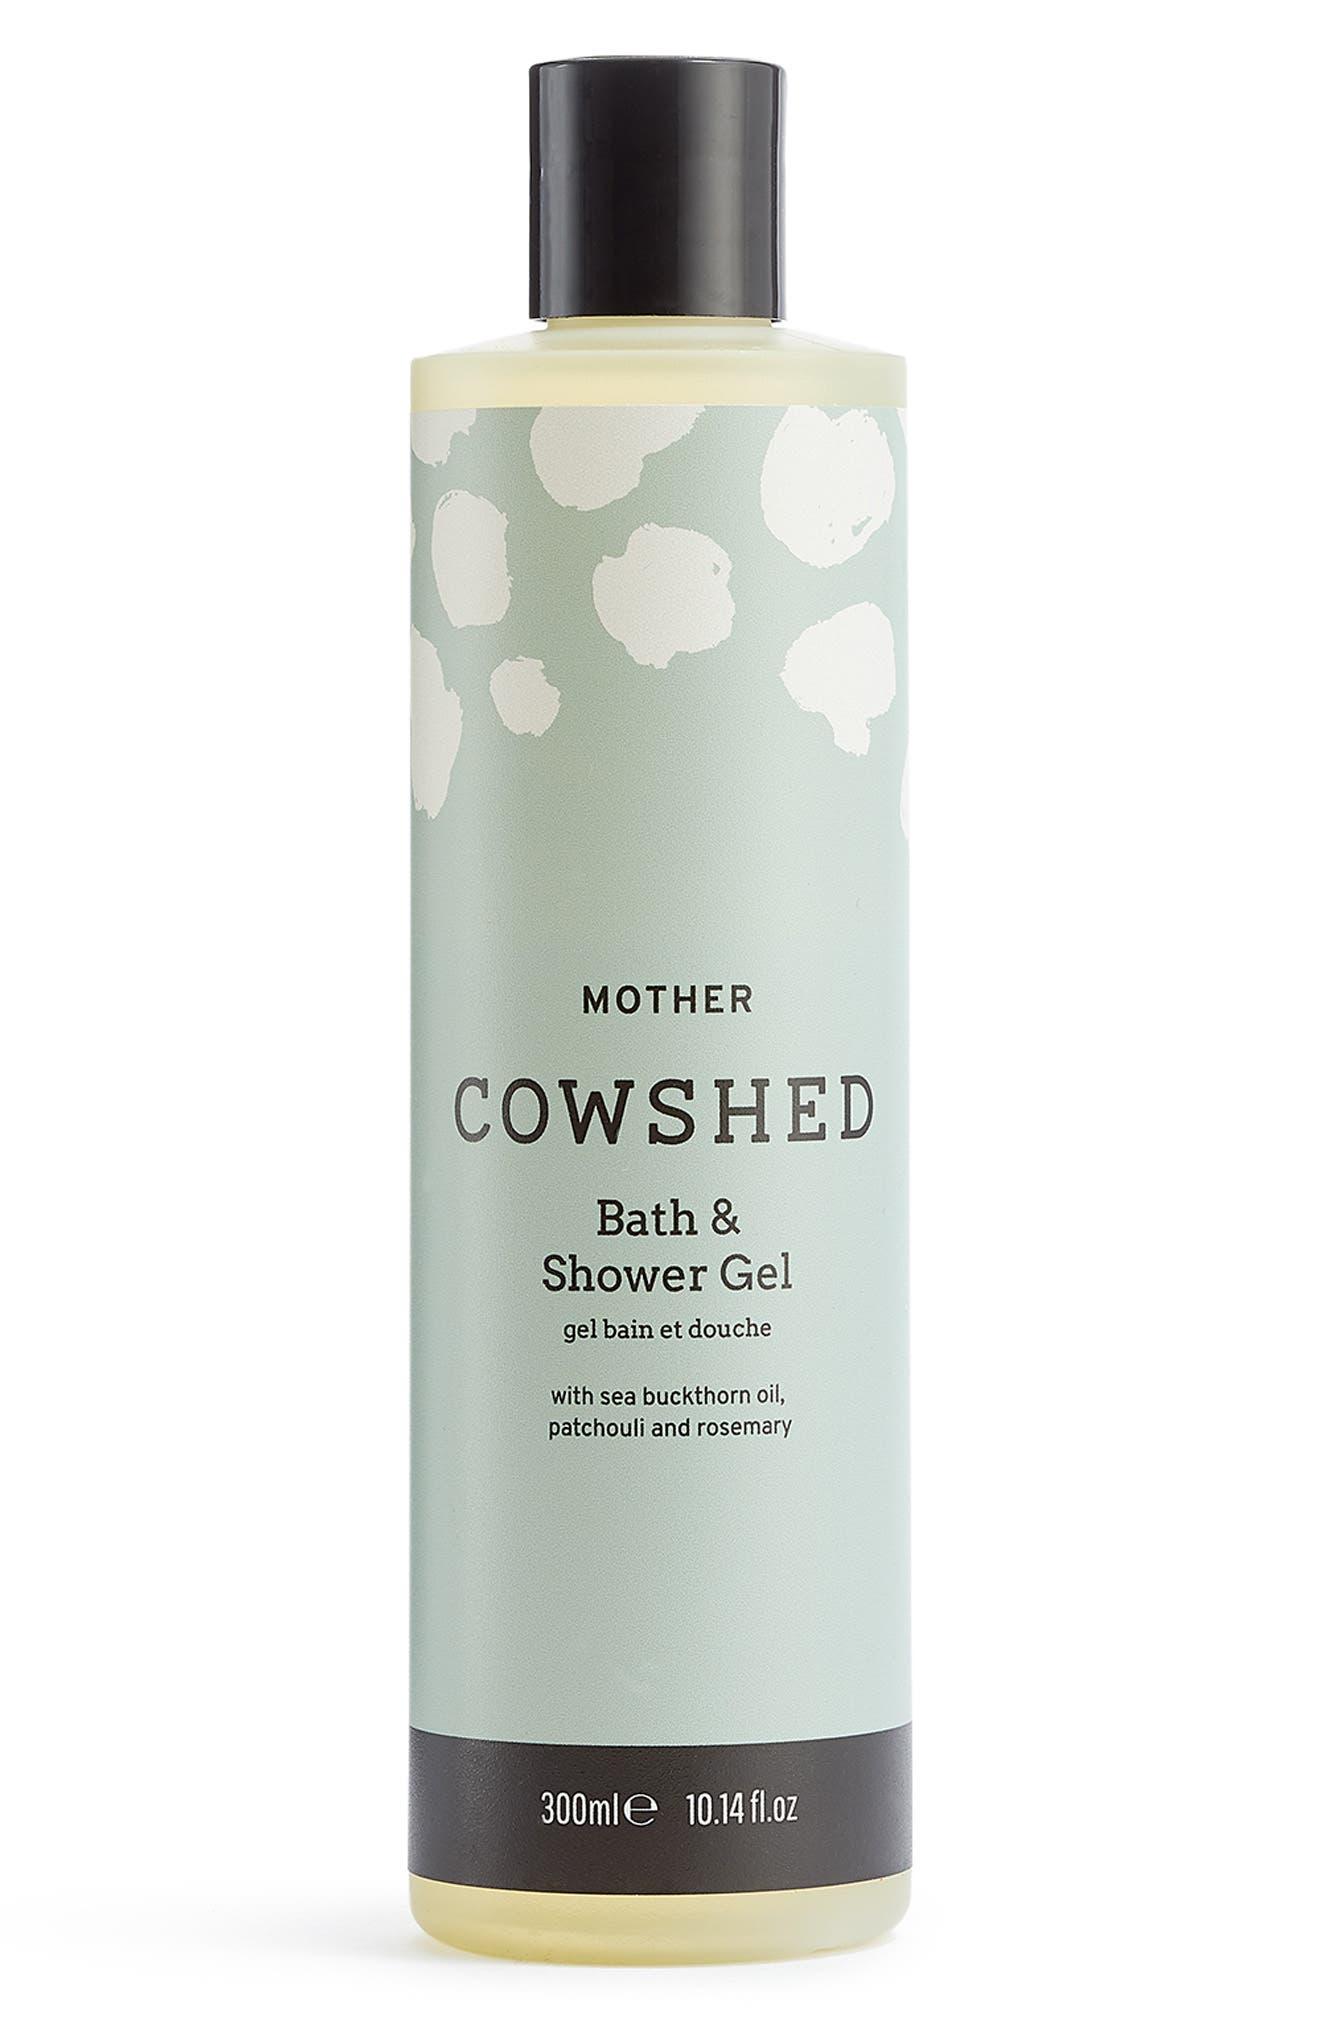 Mother Bath & Shower Gel